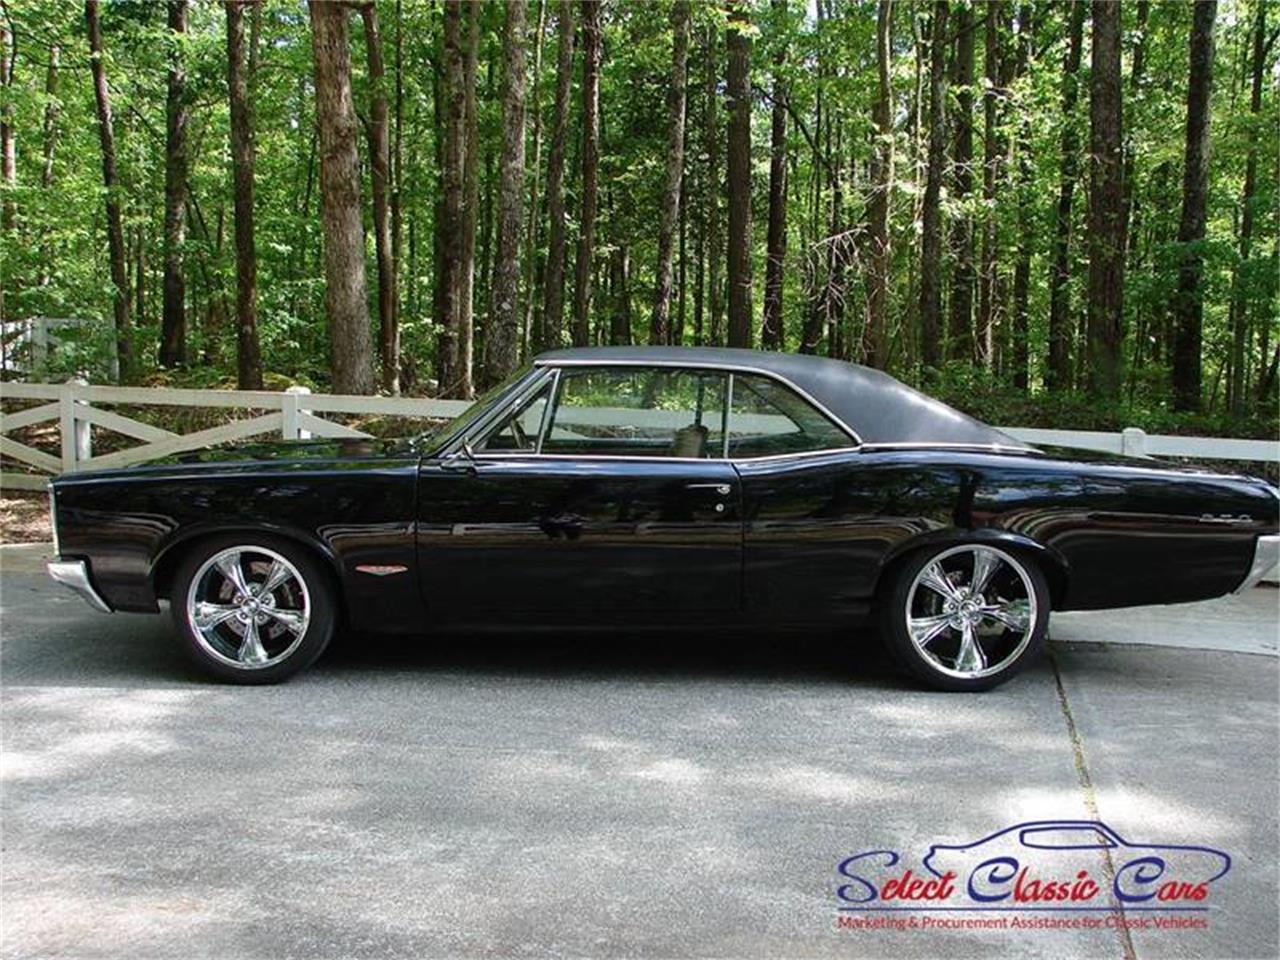 Large Picture of '66 Pontiac LeMans located in Hiram Georgia - $35,500.00 - MG30